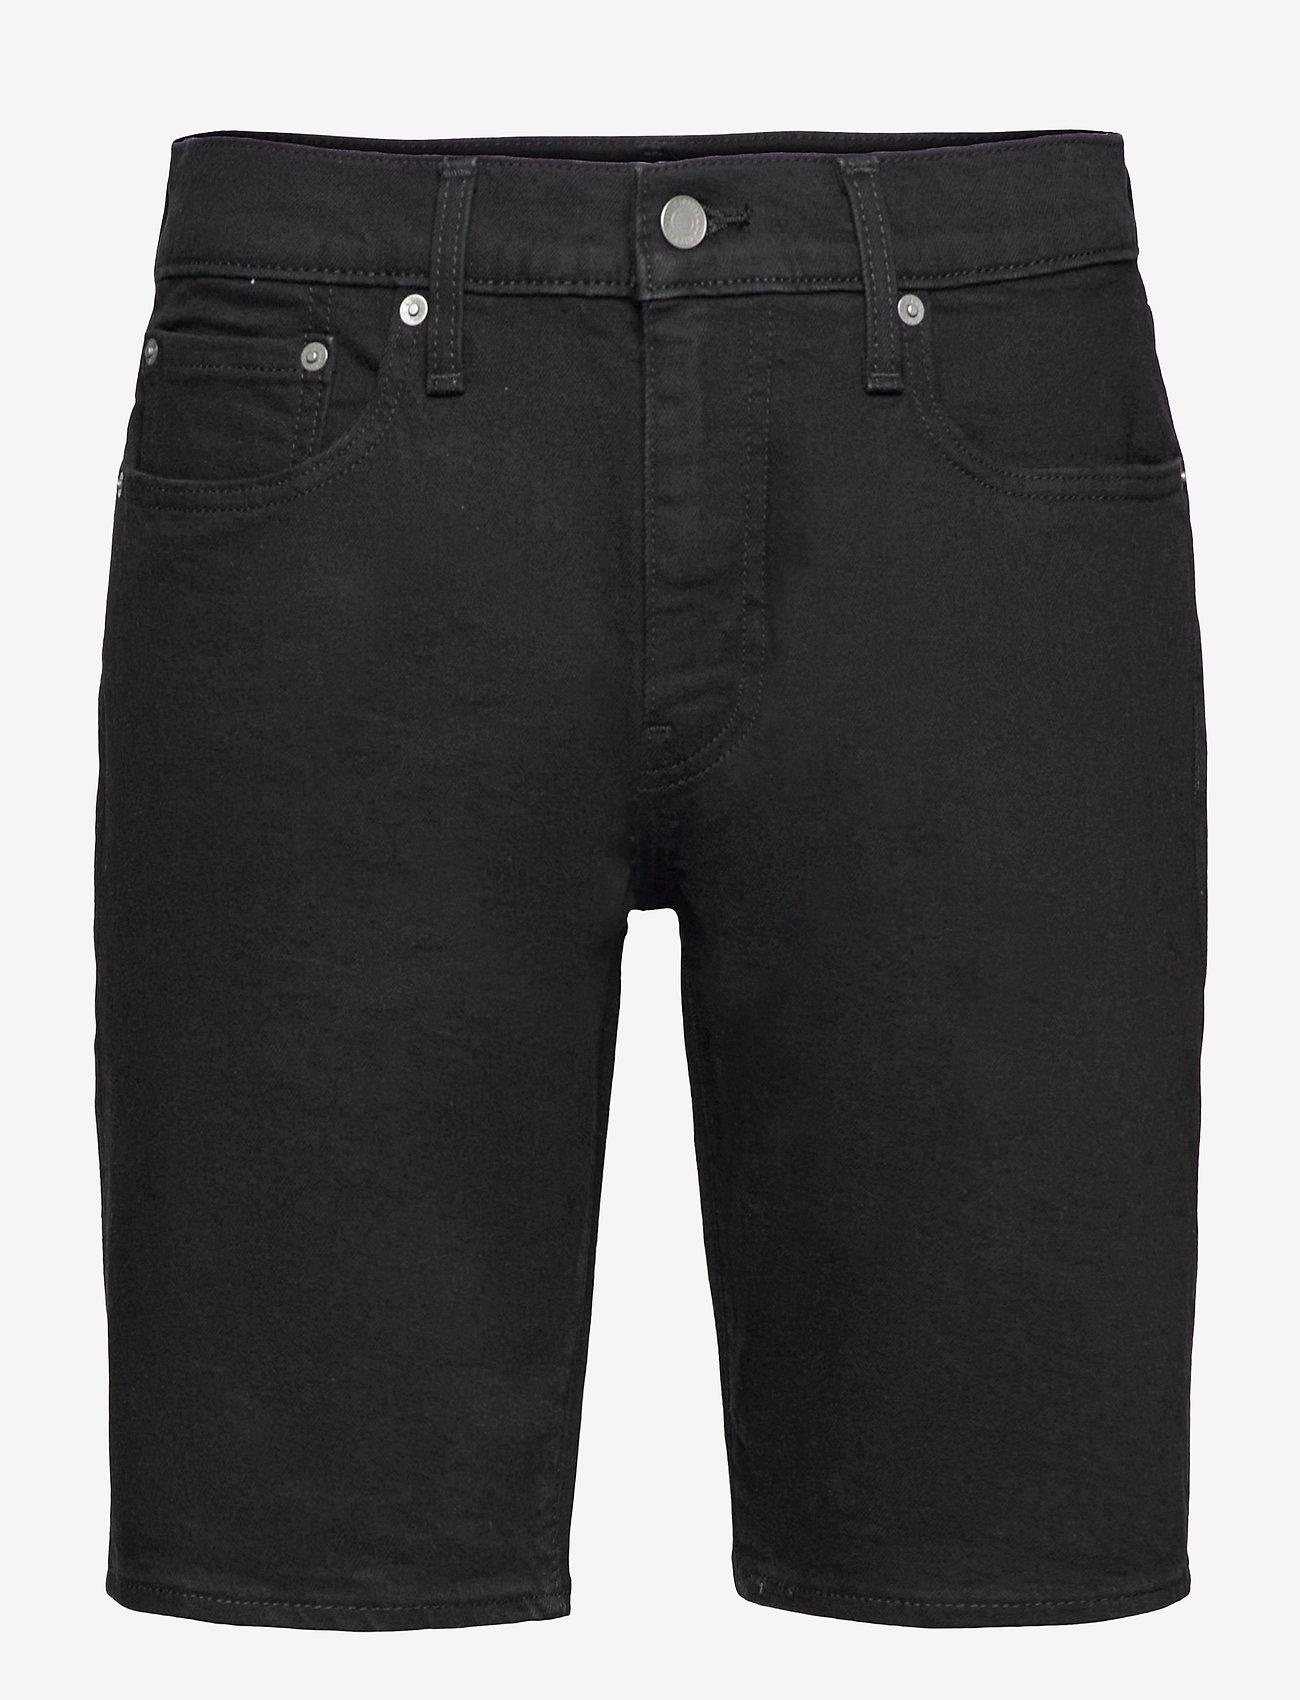 LEVI´S Men - 405 STANDARD SHORT BLACK RINSE - jeansowe szorty - blacks - 0